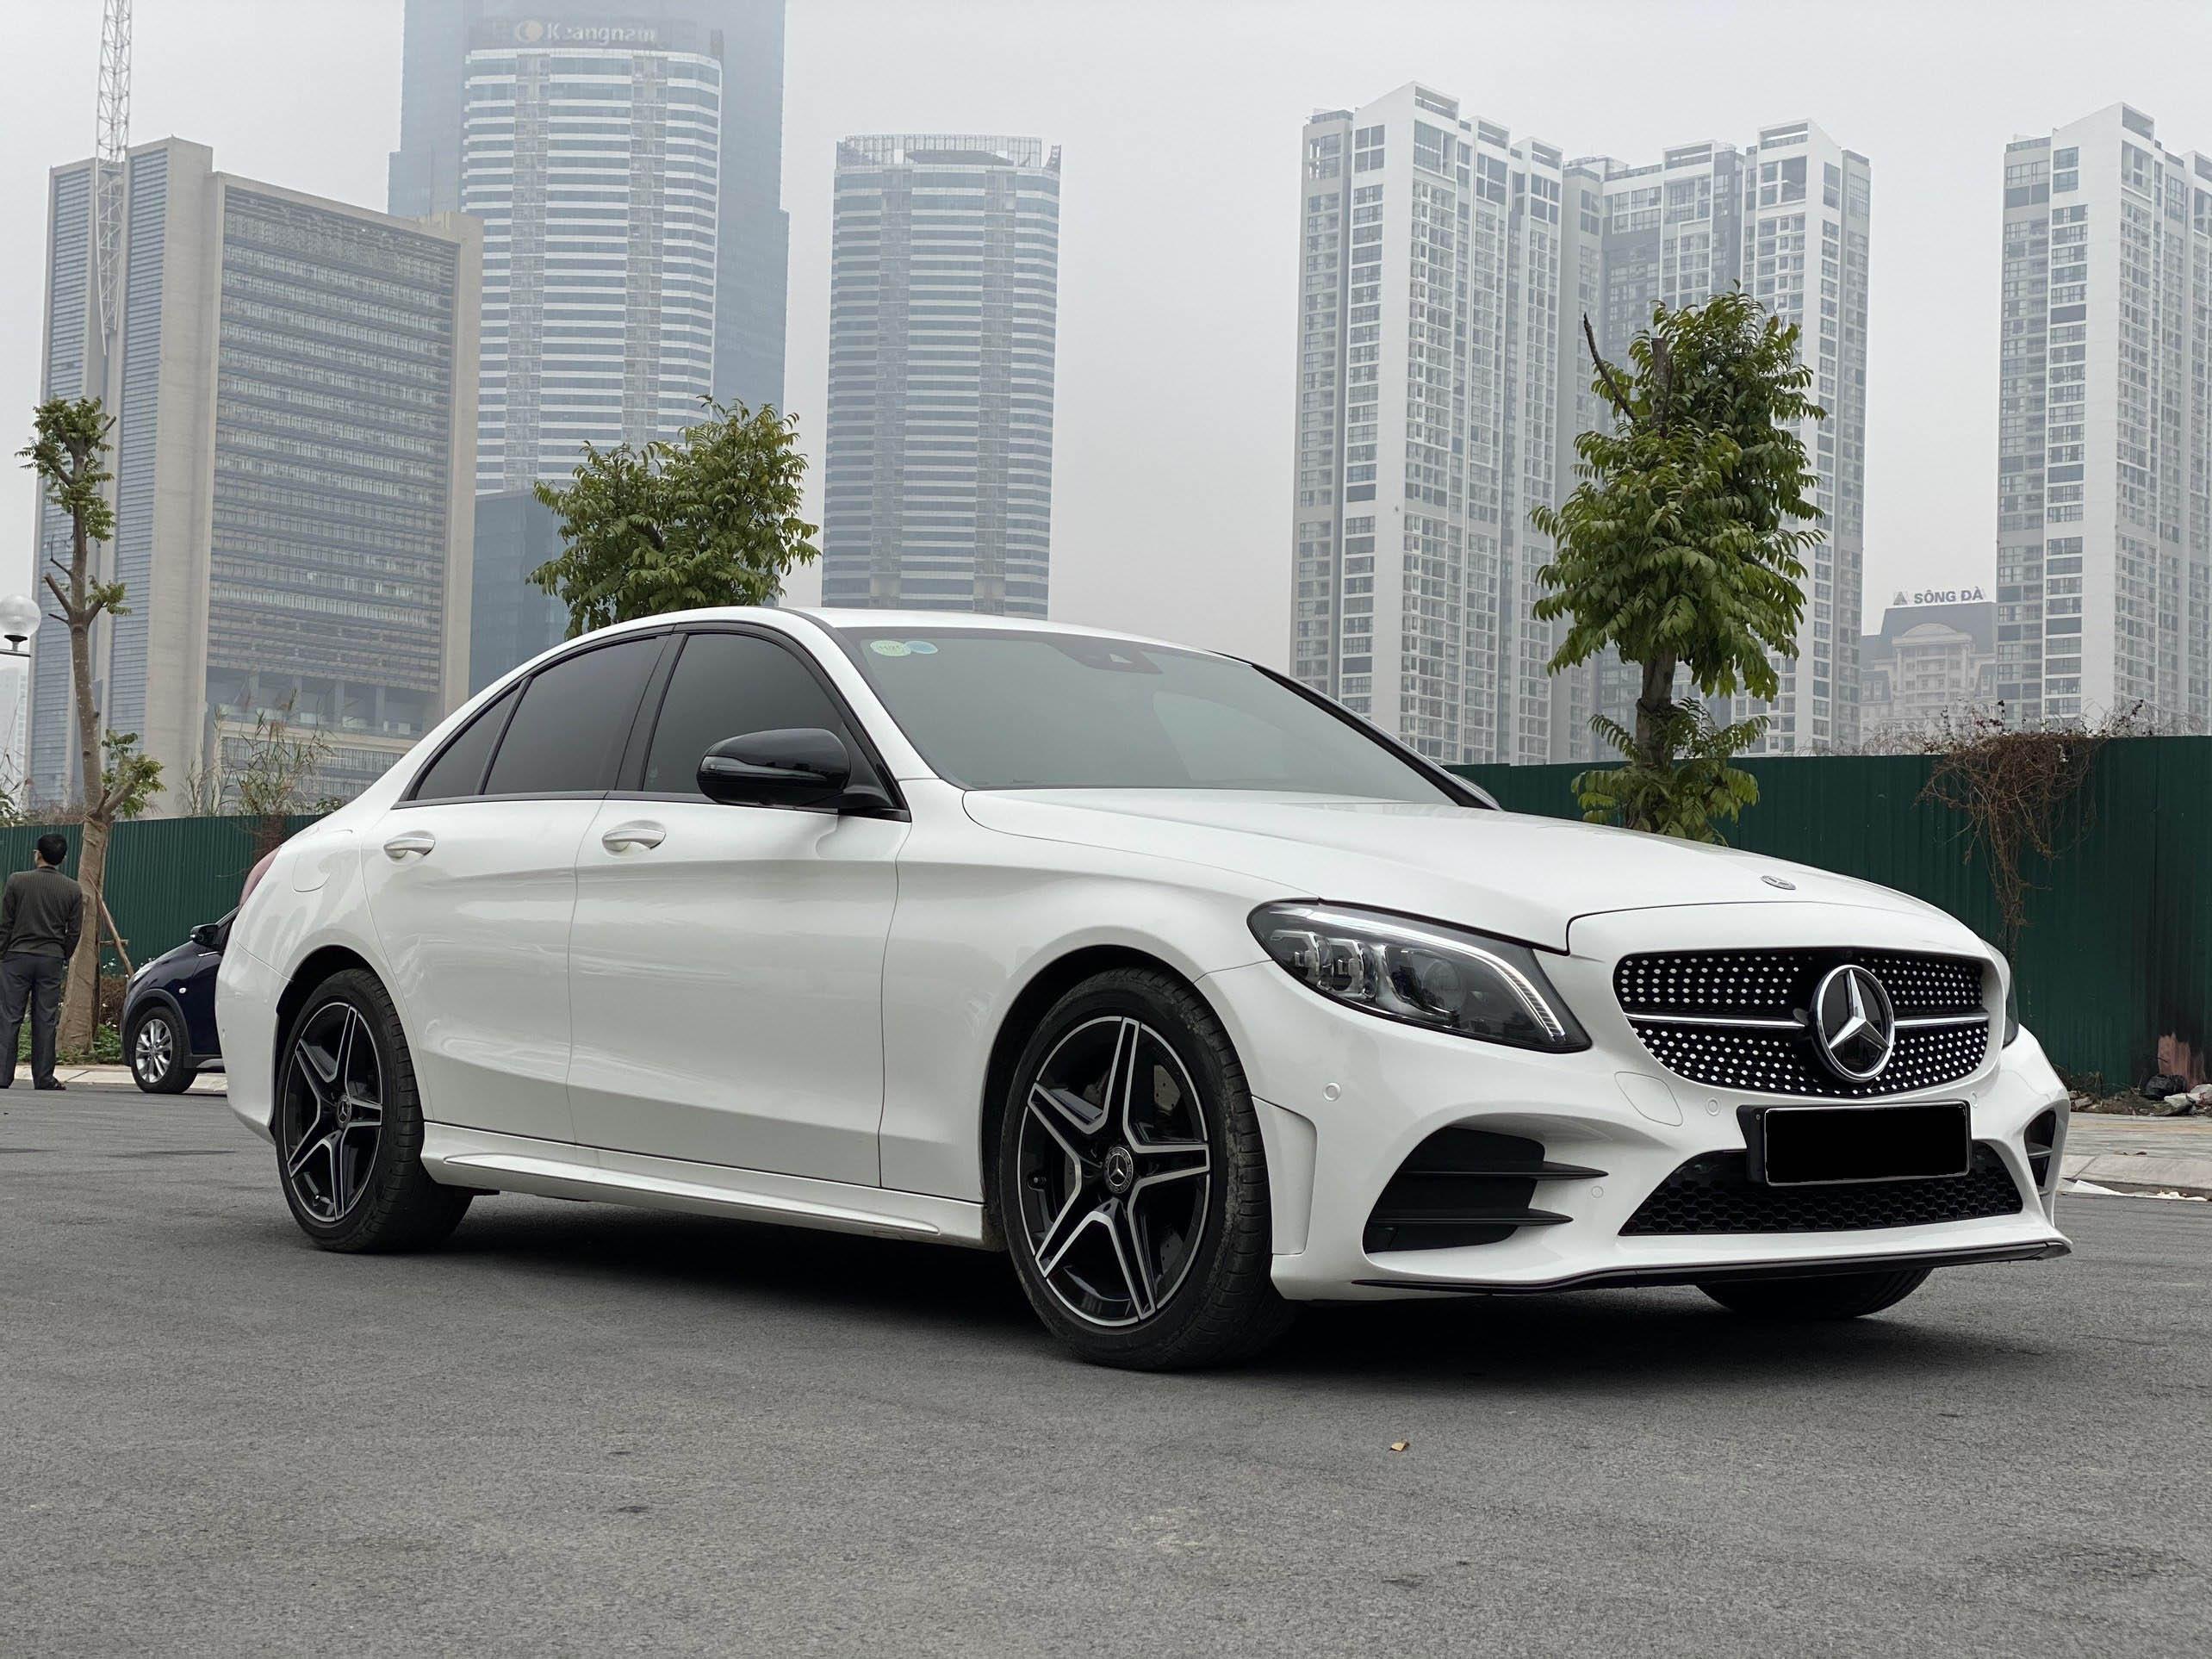 Mercedes C300 AMG Sx 2019